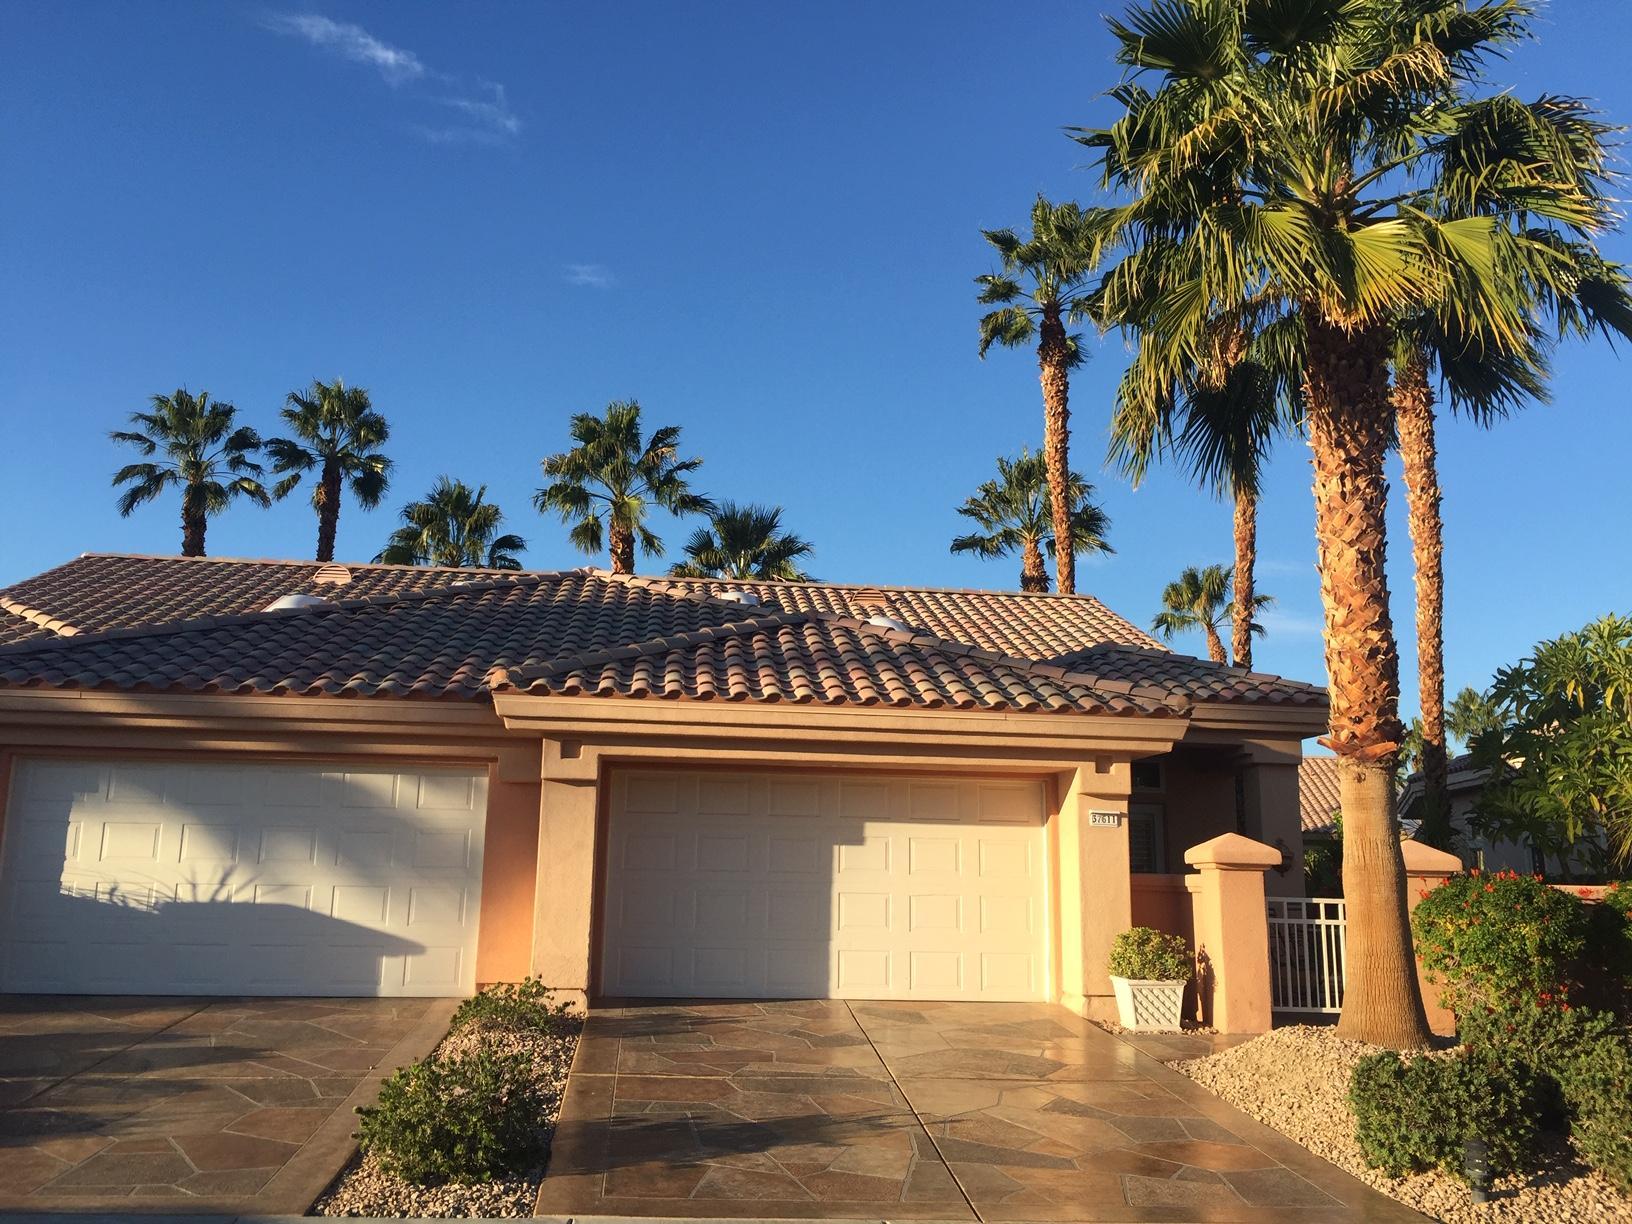 Photo of 37611 Blue Sky Ave. Avenue, Palm Desert, CA 92211